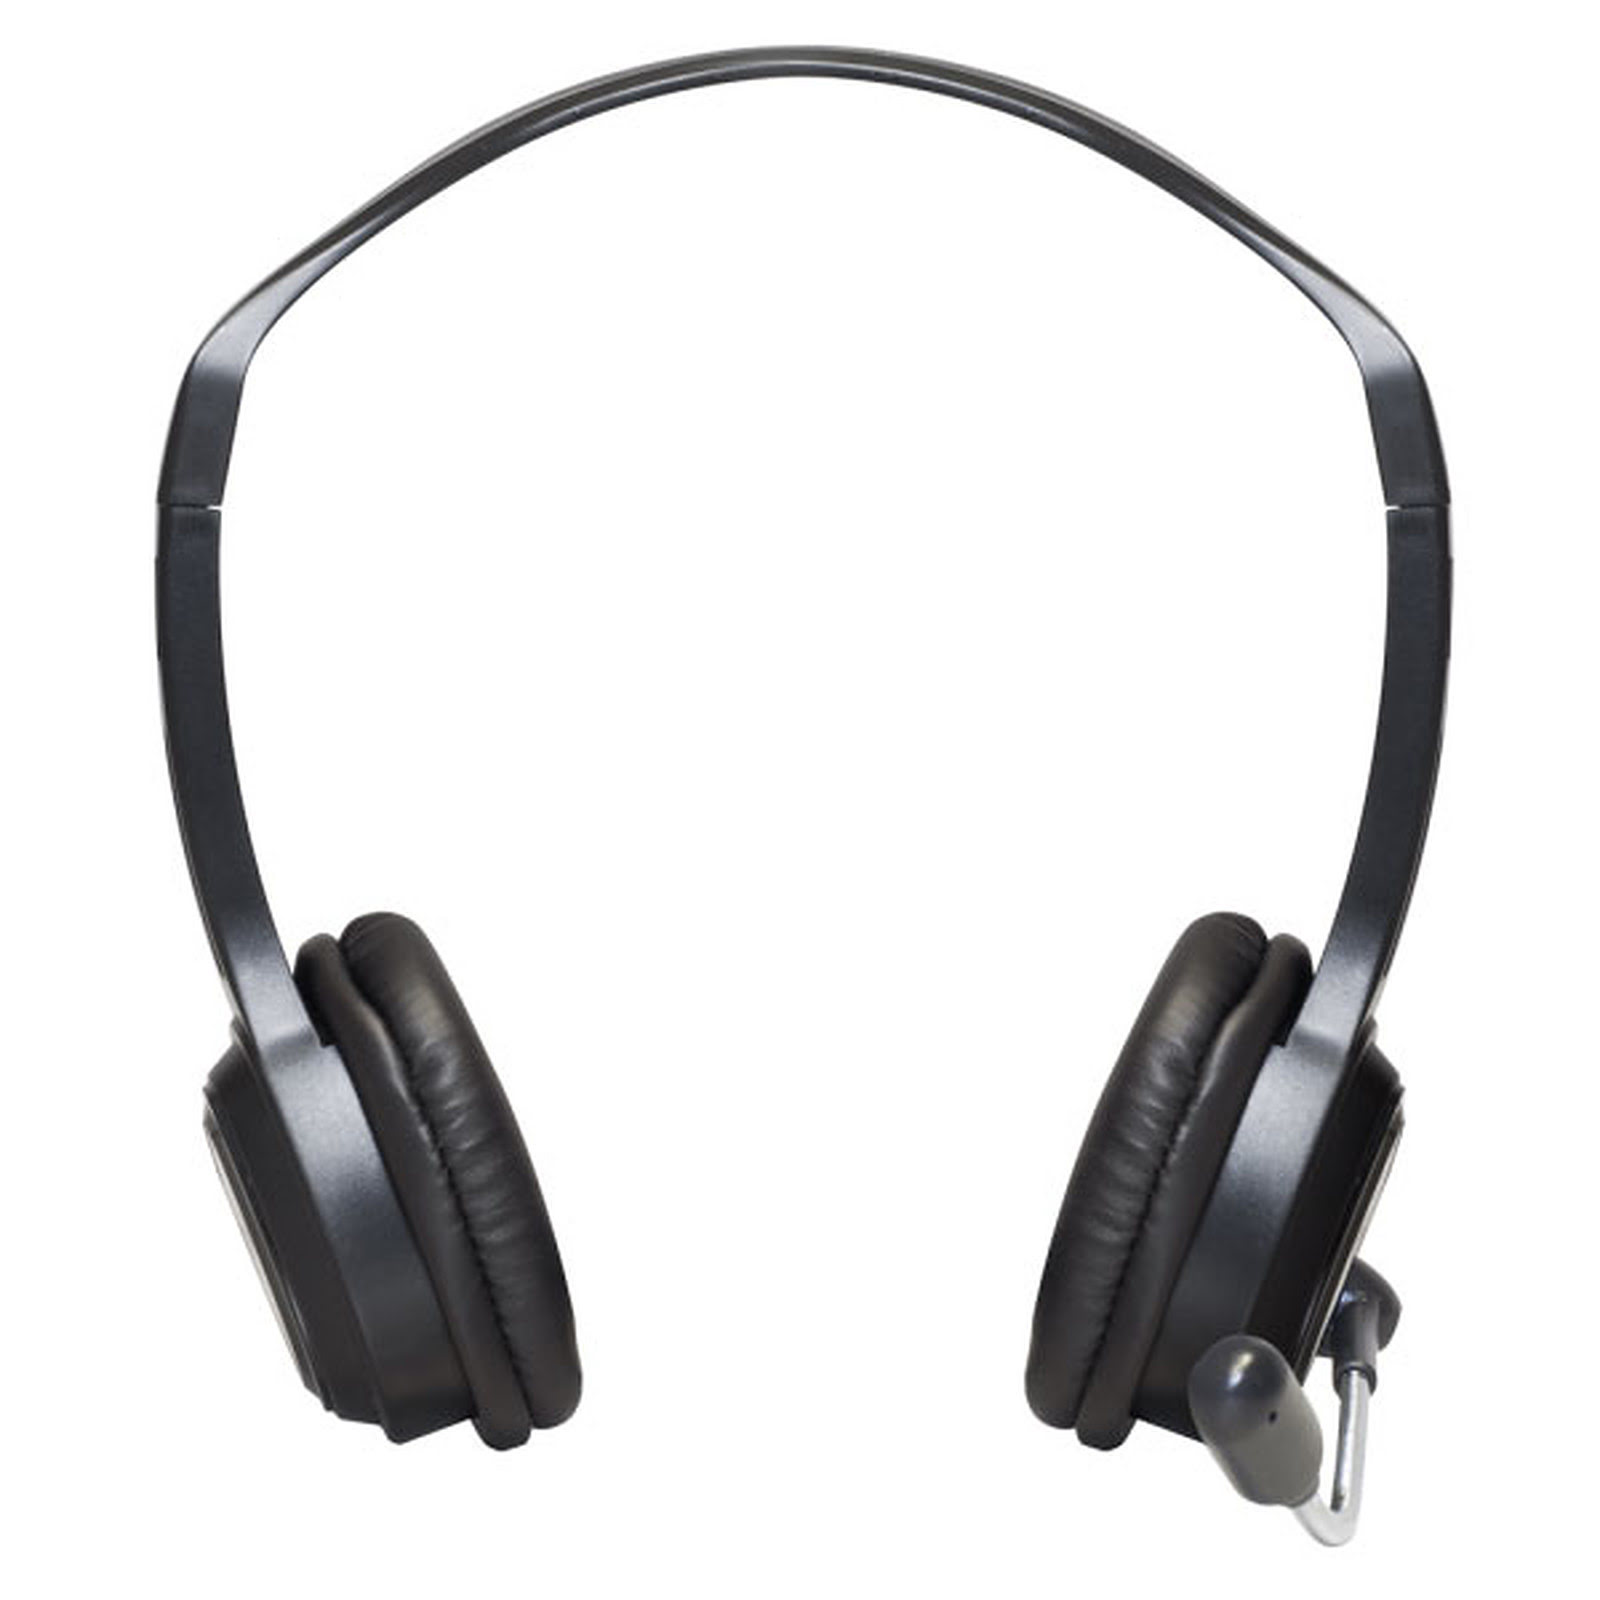 Advance Casque Multimédia Headphonics Smart Stereo - Micro-casque - 3